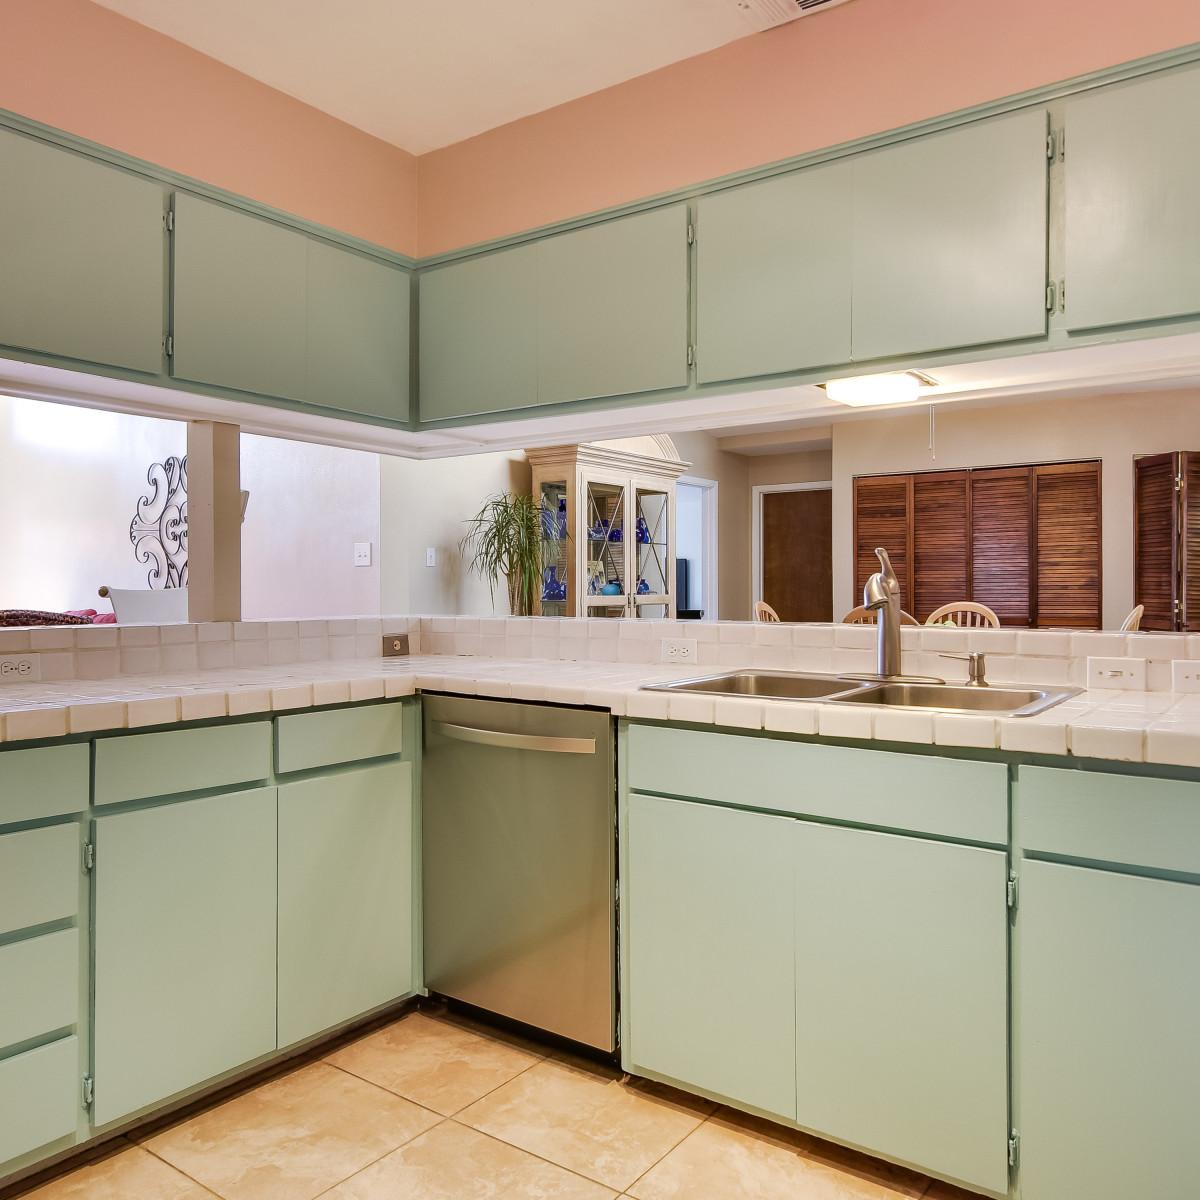 3010 Albin San Antonio house for sale kitchen